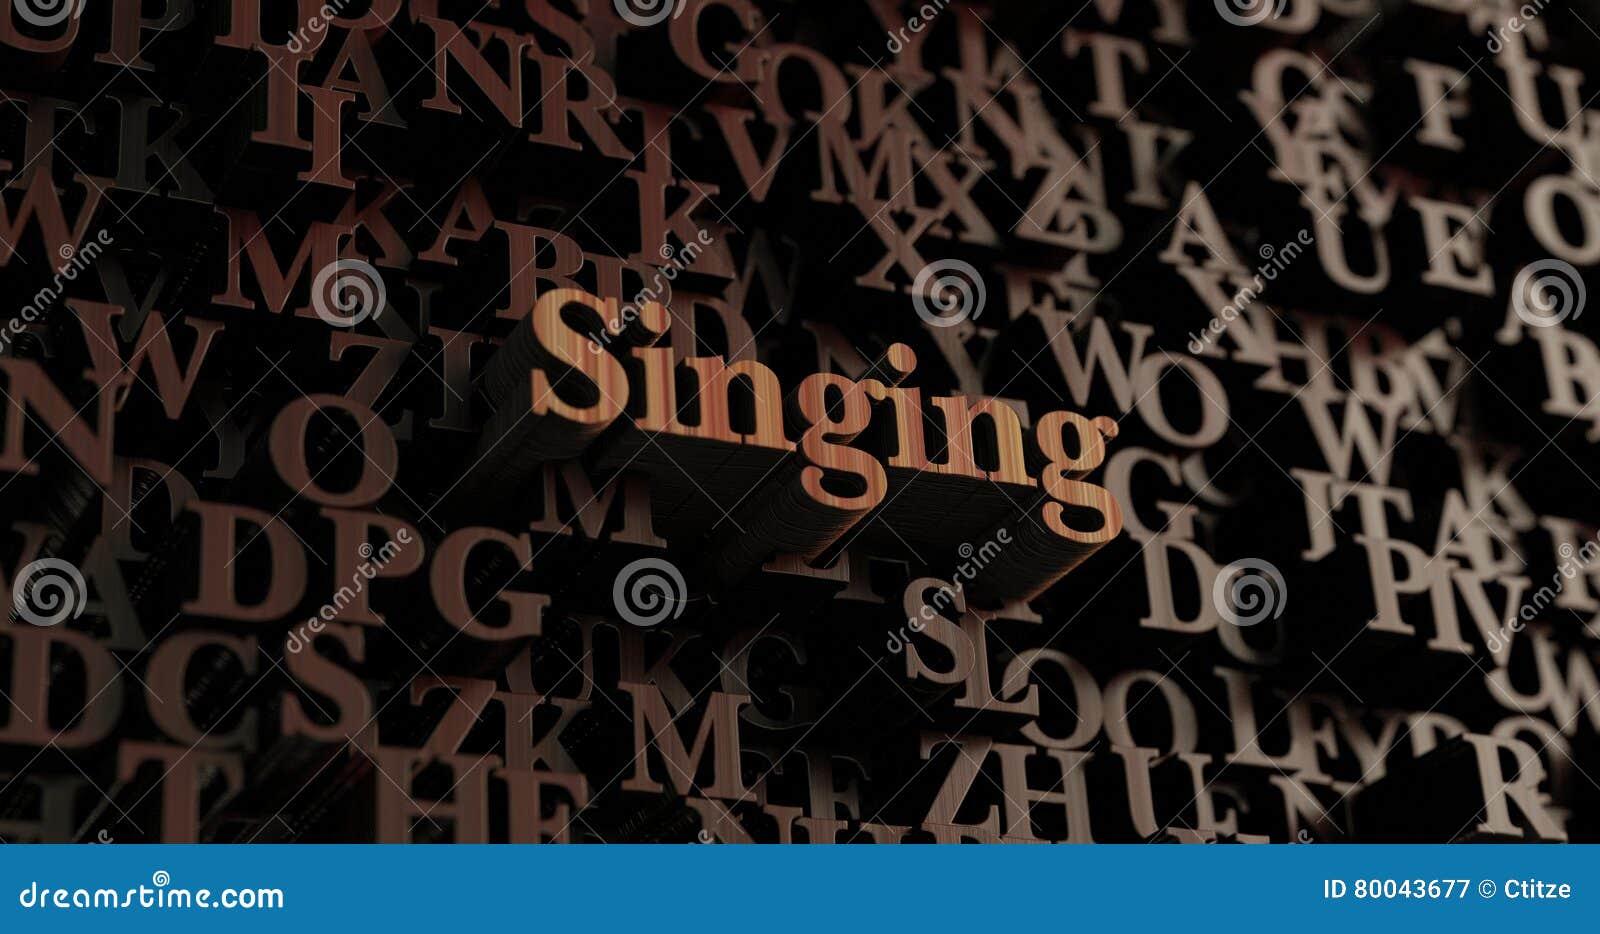 singing wooden 3d rendered letters message stock illustration